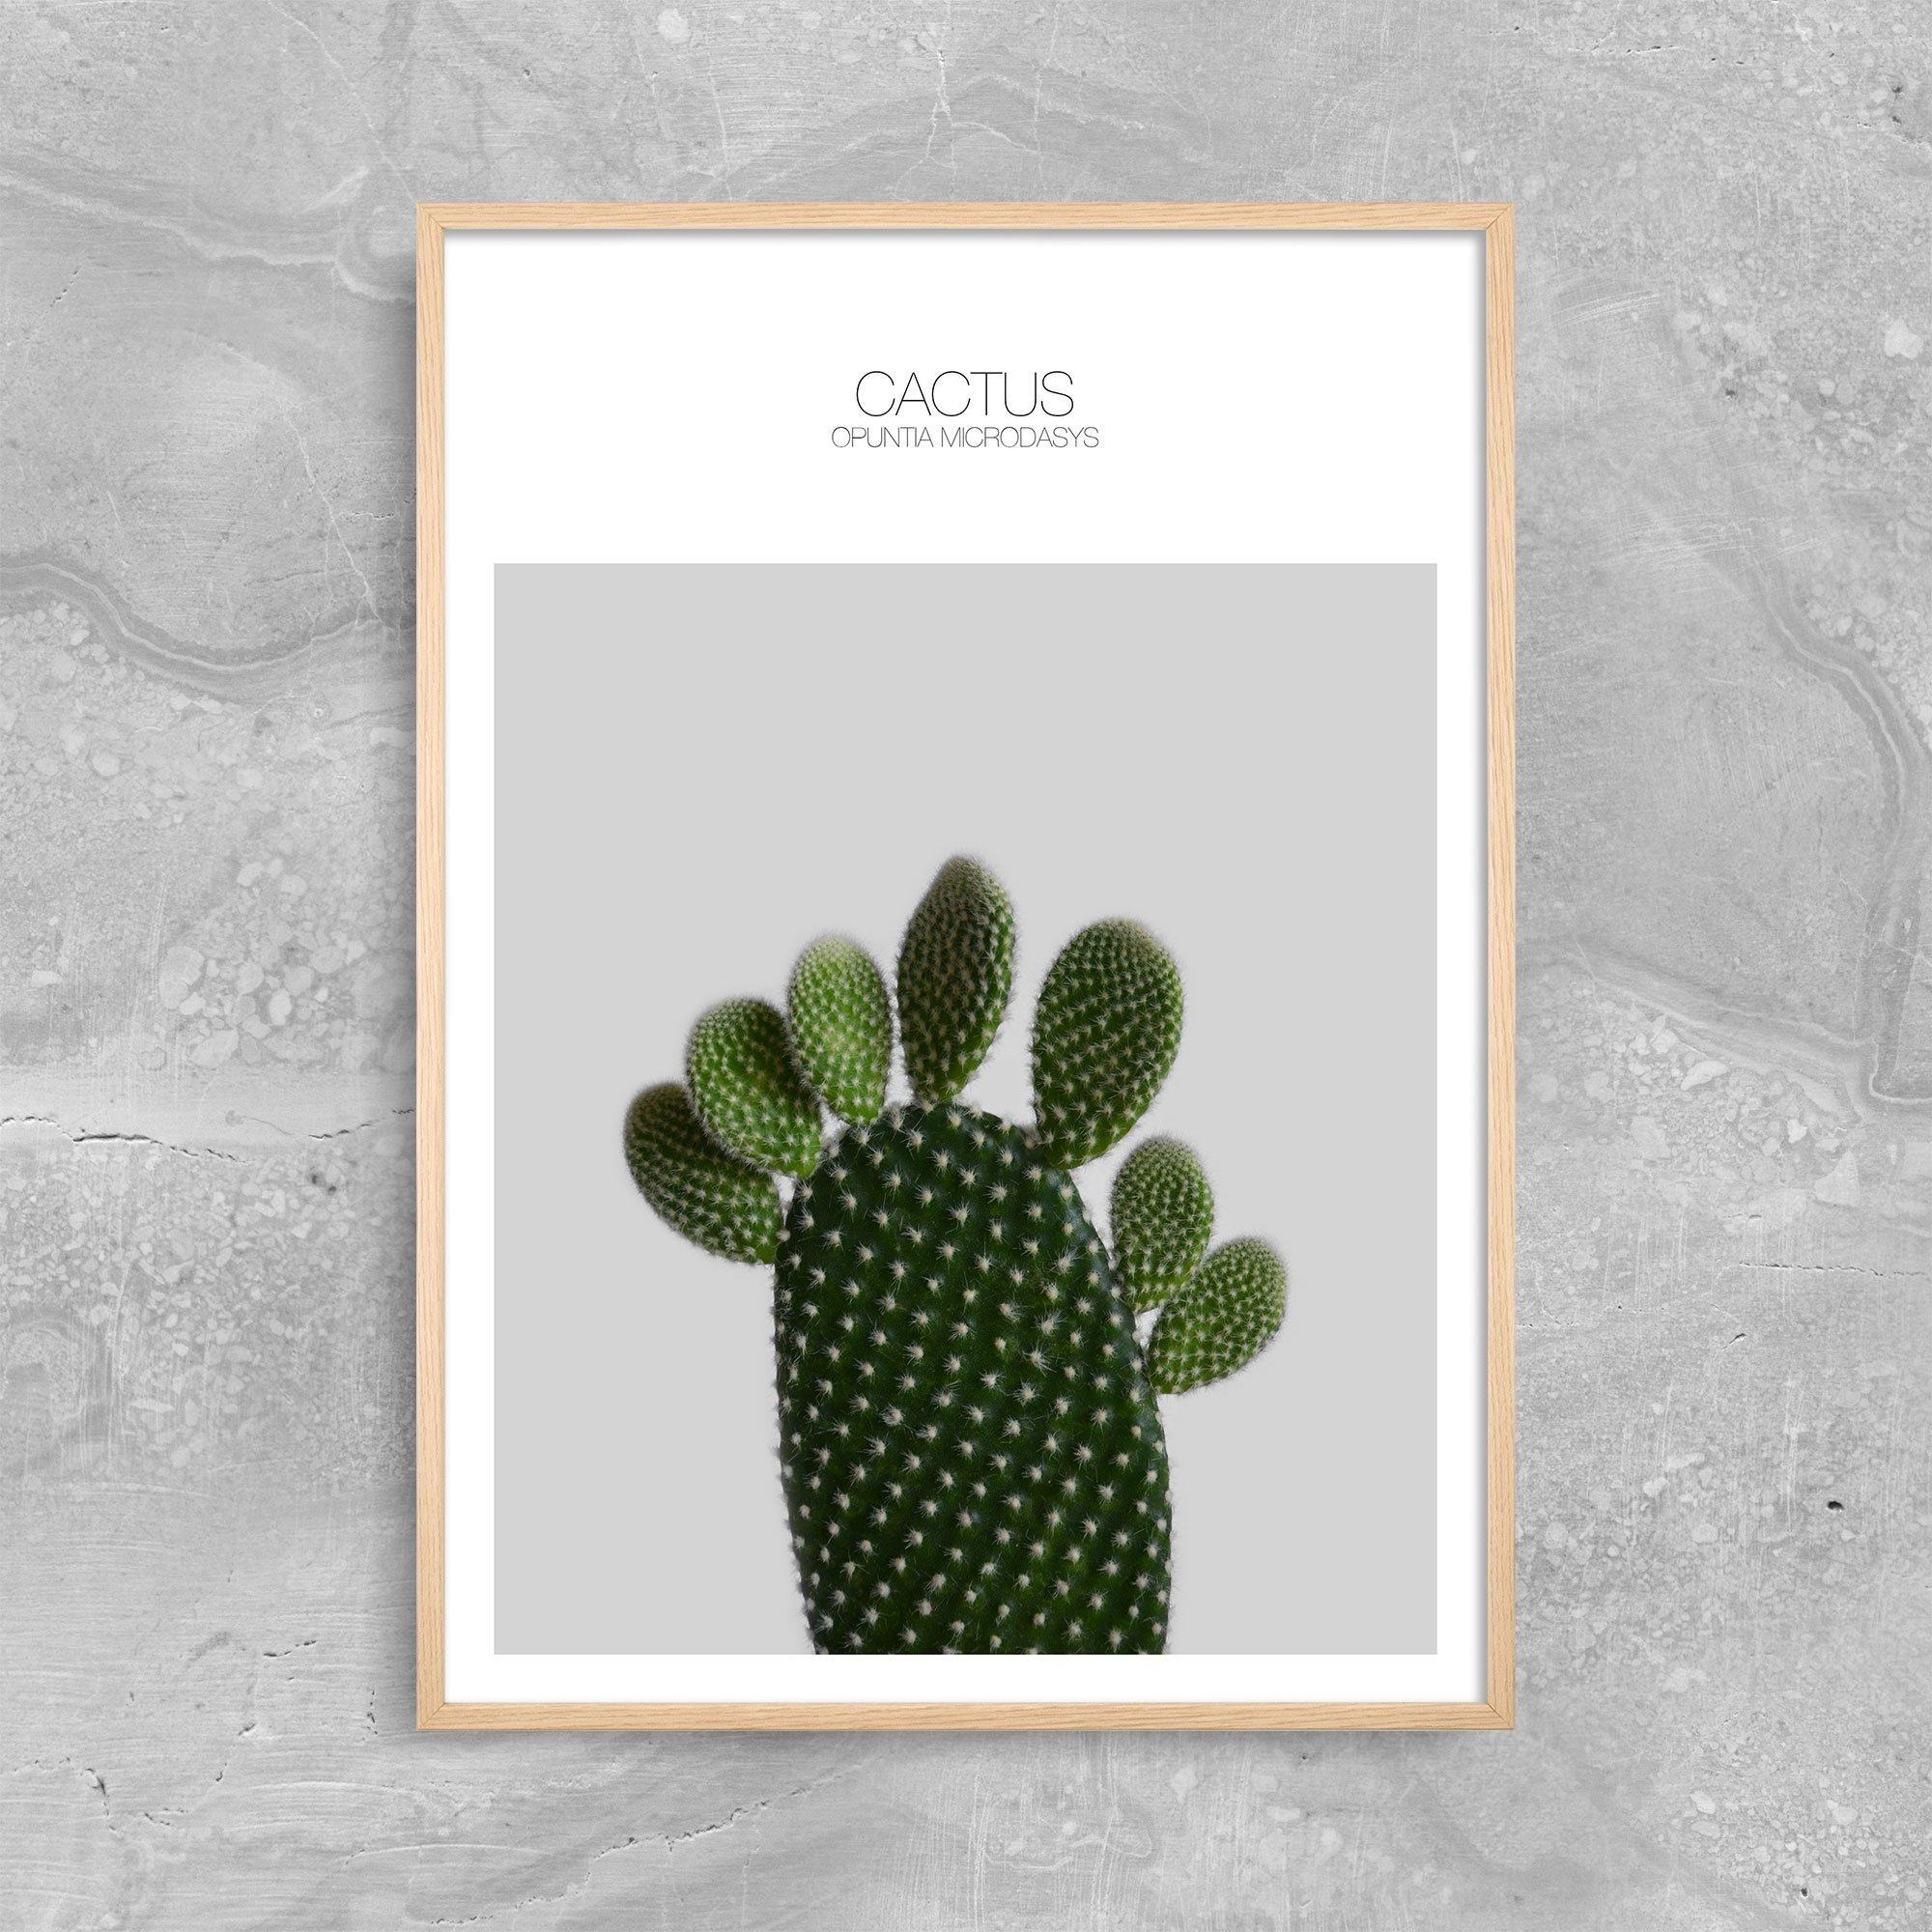 Cactus Opuntia Microdasys 2